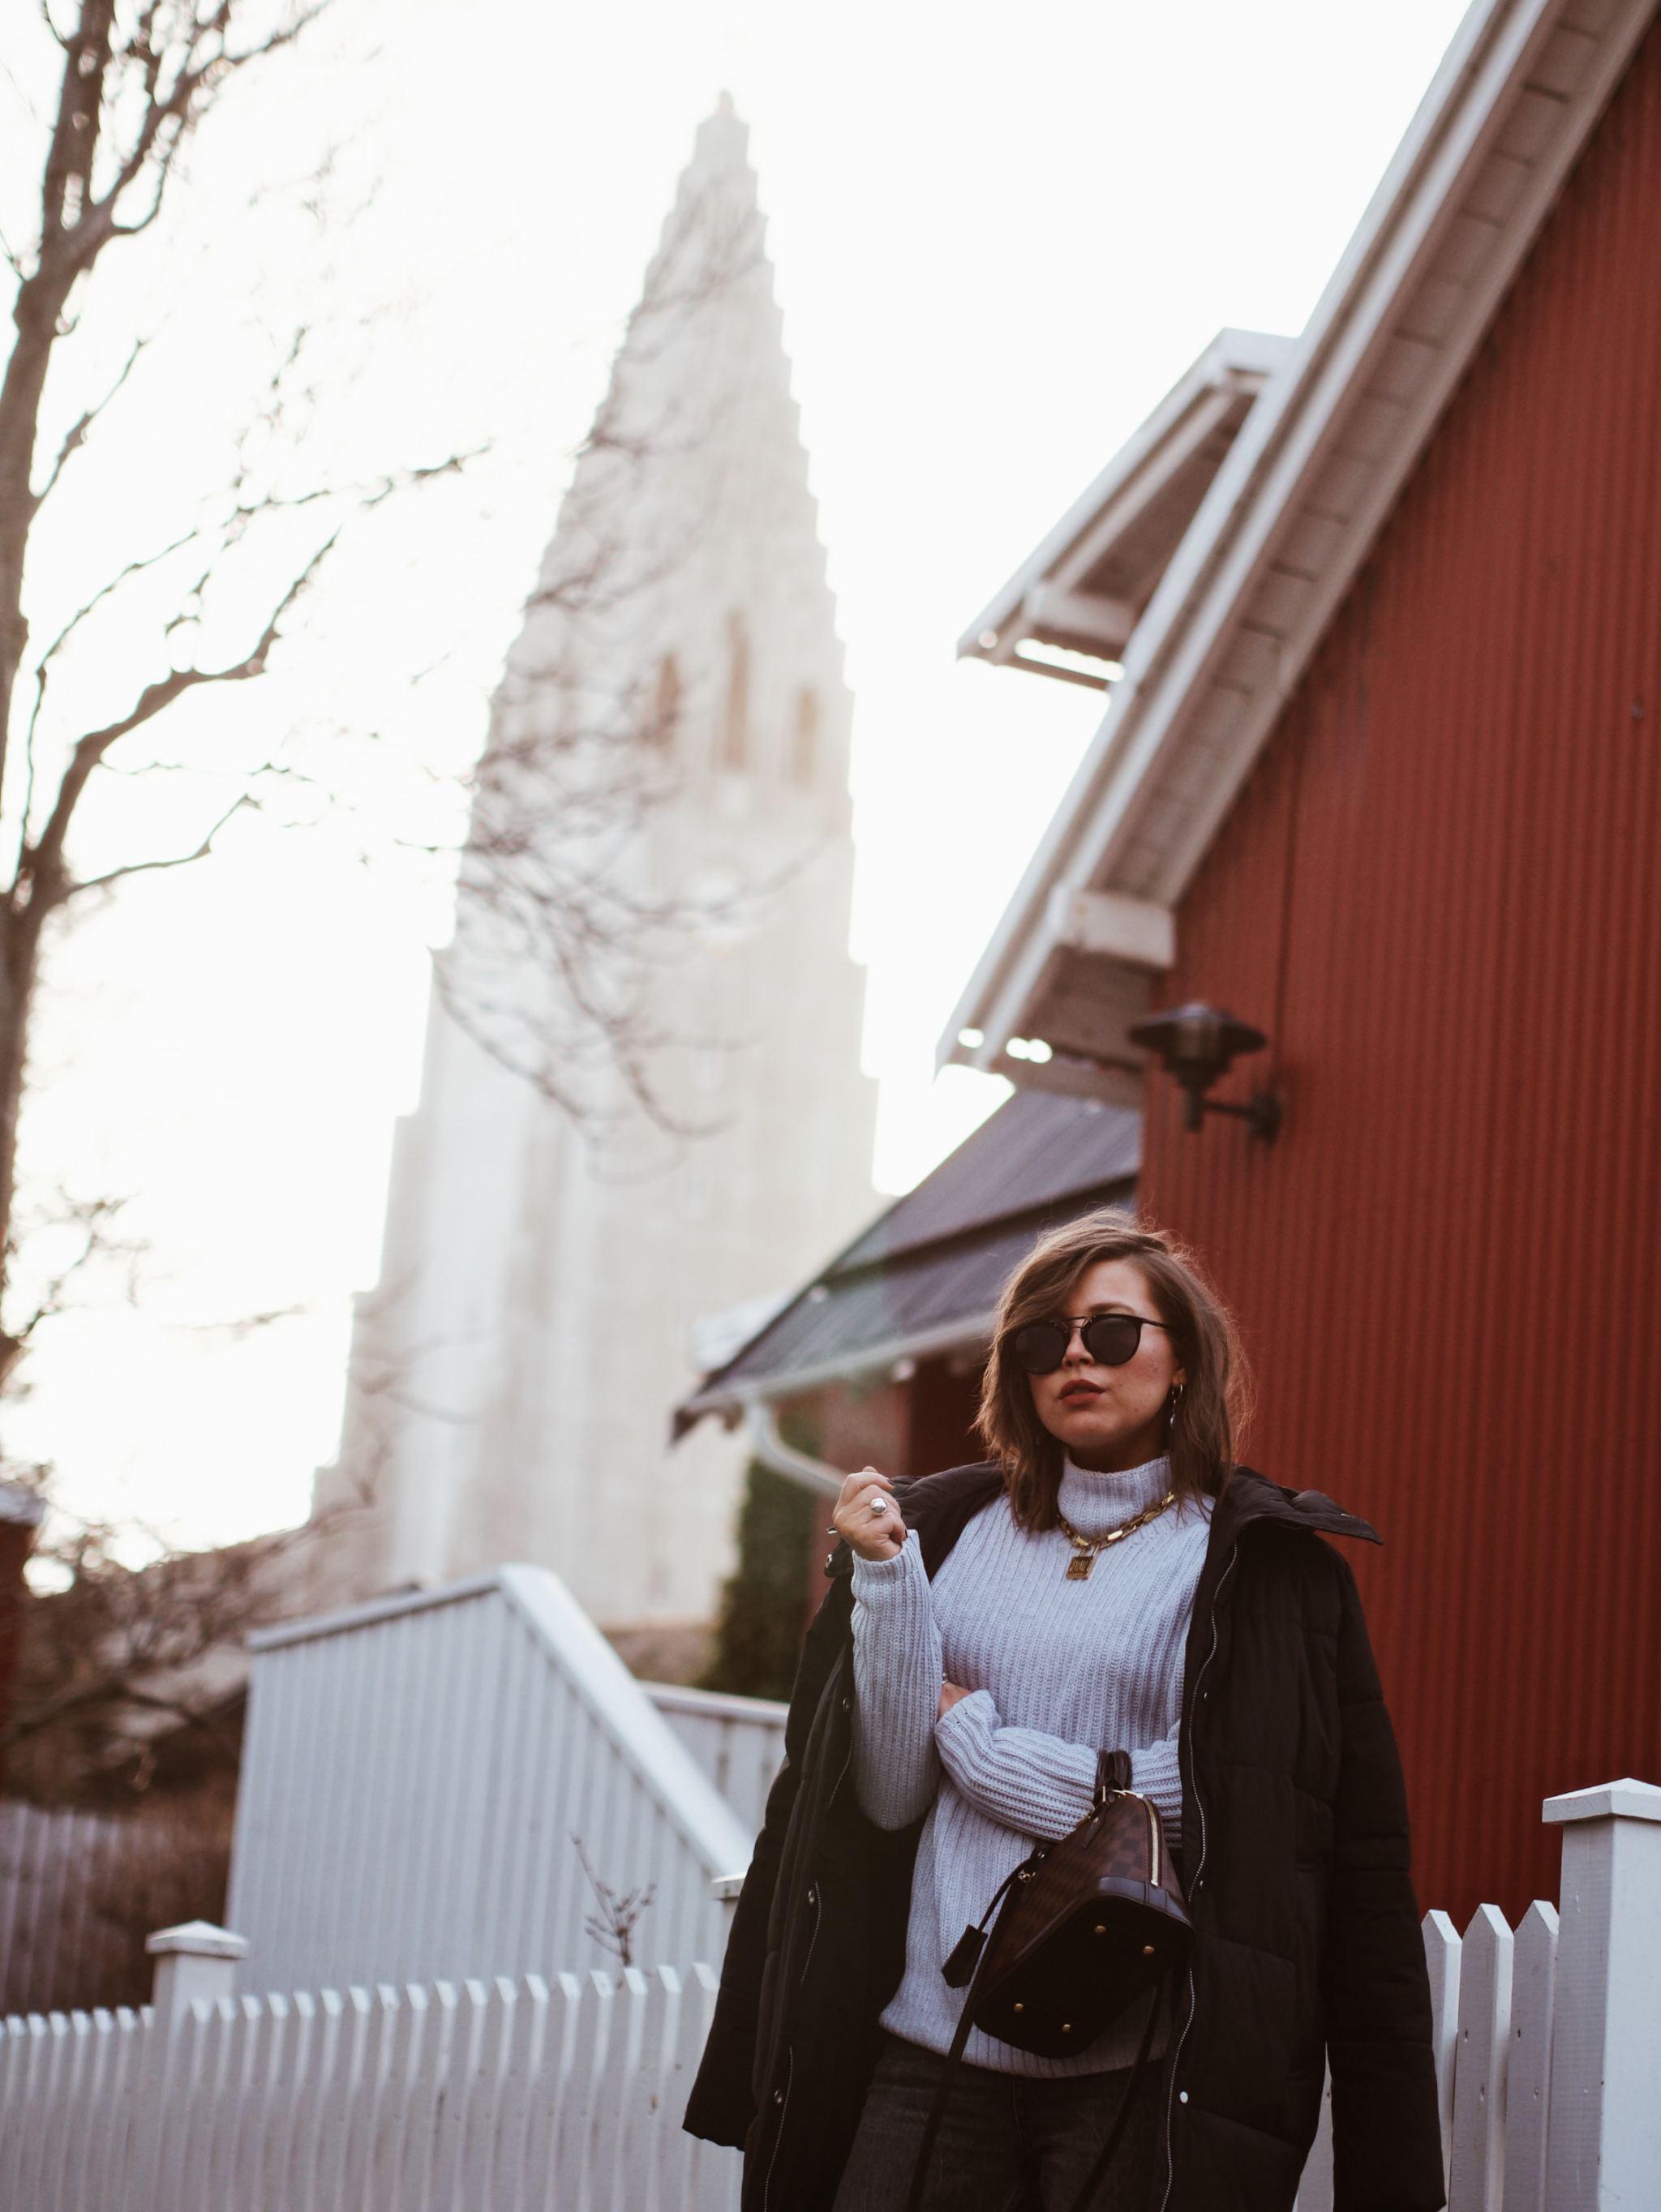 manchester fashion blogger, manchester bloggers, travel blogger, Reykjavik, Iceland Reykjavik, visit Reykjavik, visit Reykjavik, fashion blogger,